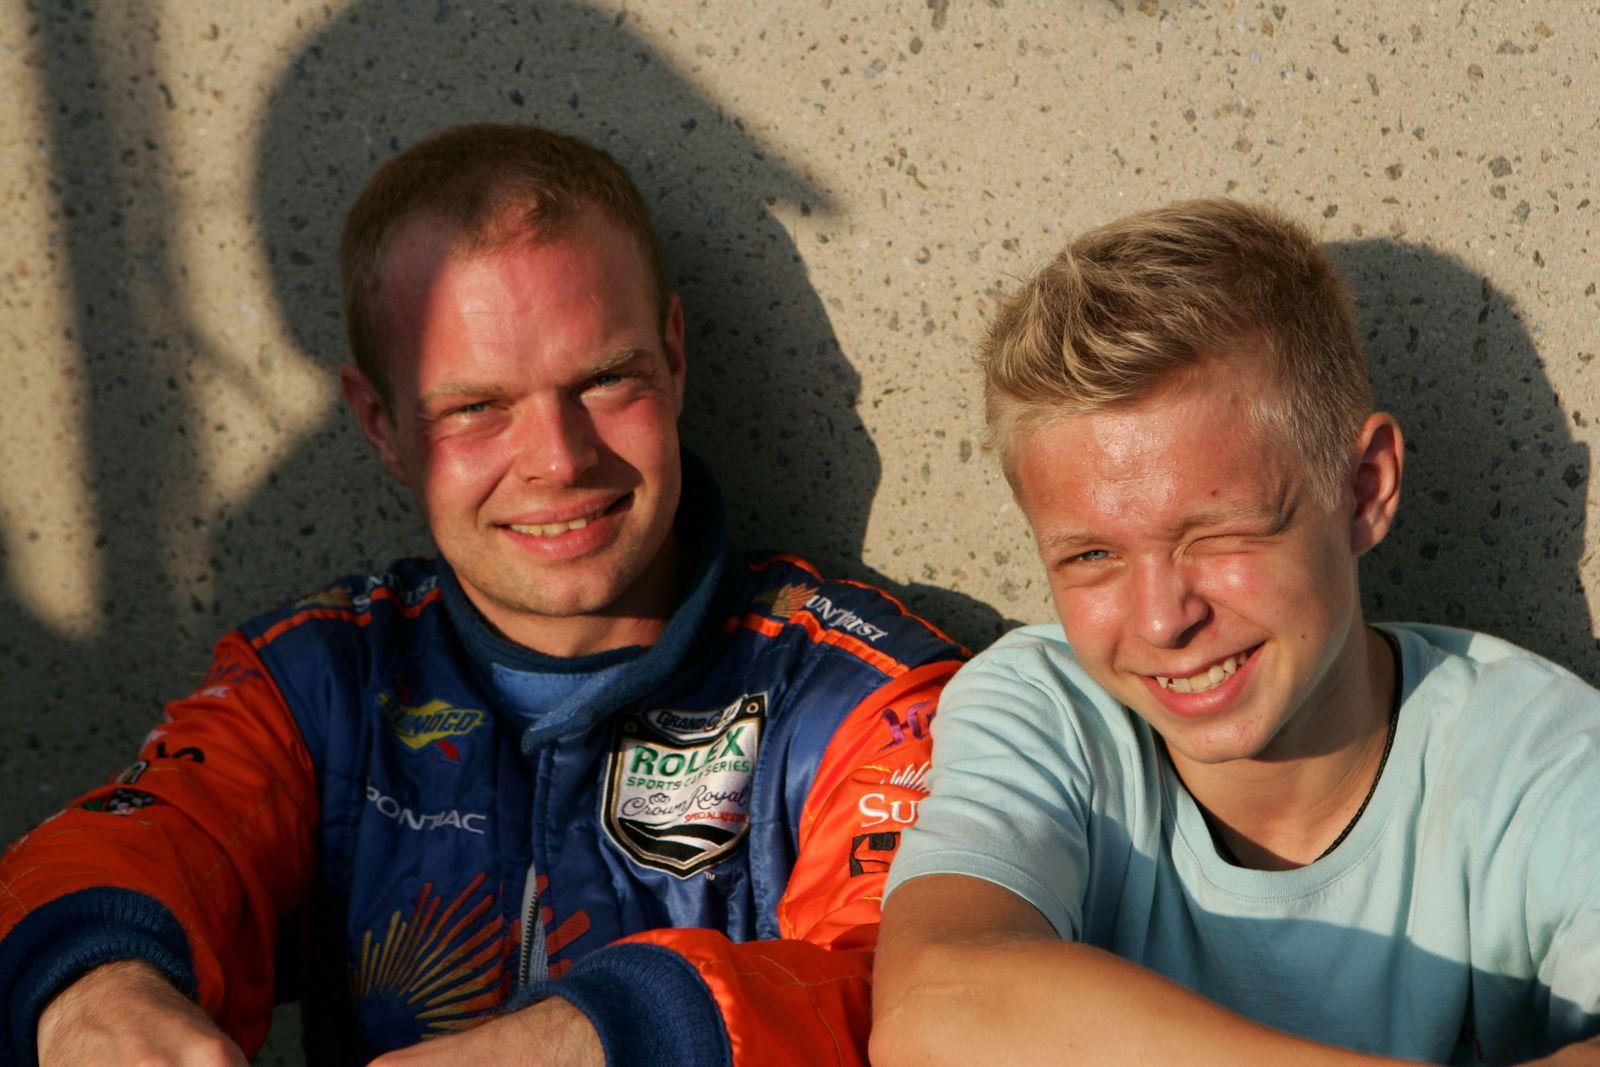 Jan Magnussen (DEN) SunTrust Racing with his son Kevin Magnussen (DEN) Grand-Am, Rd12, Montreal, Canada, 3 August 2007.